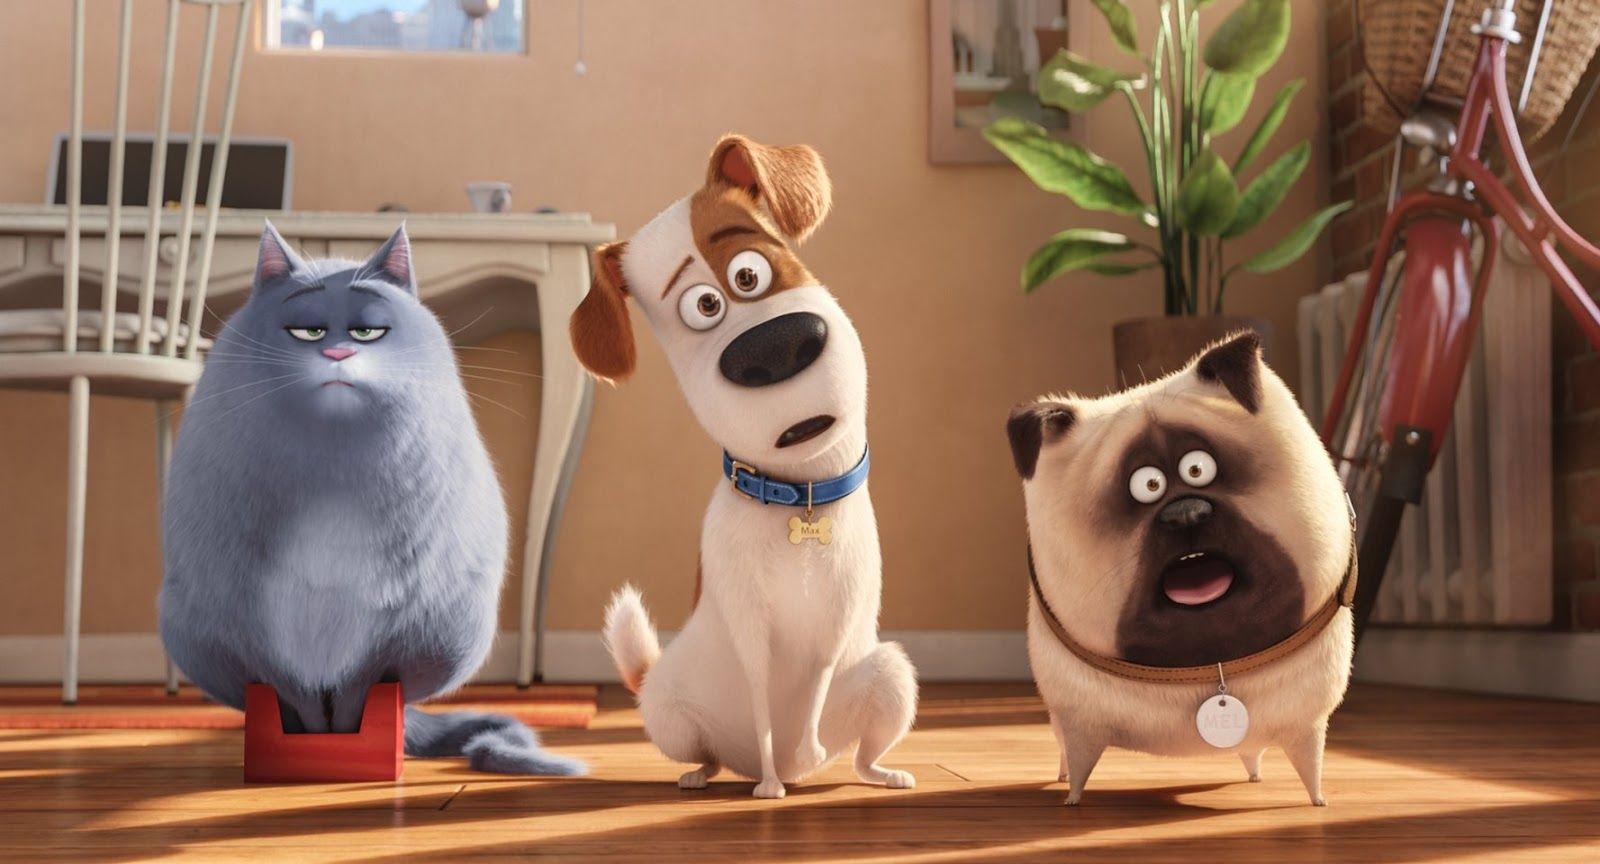 The Secret Life Of Pets Image 1 Film